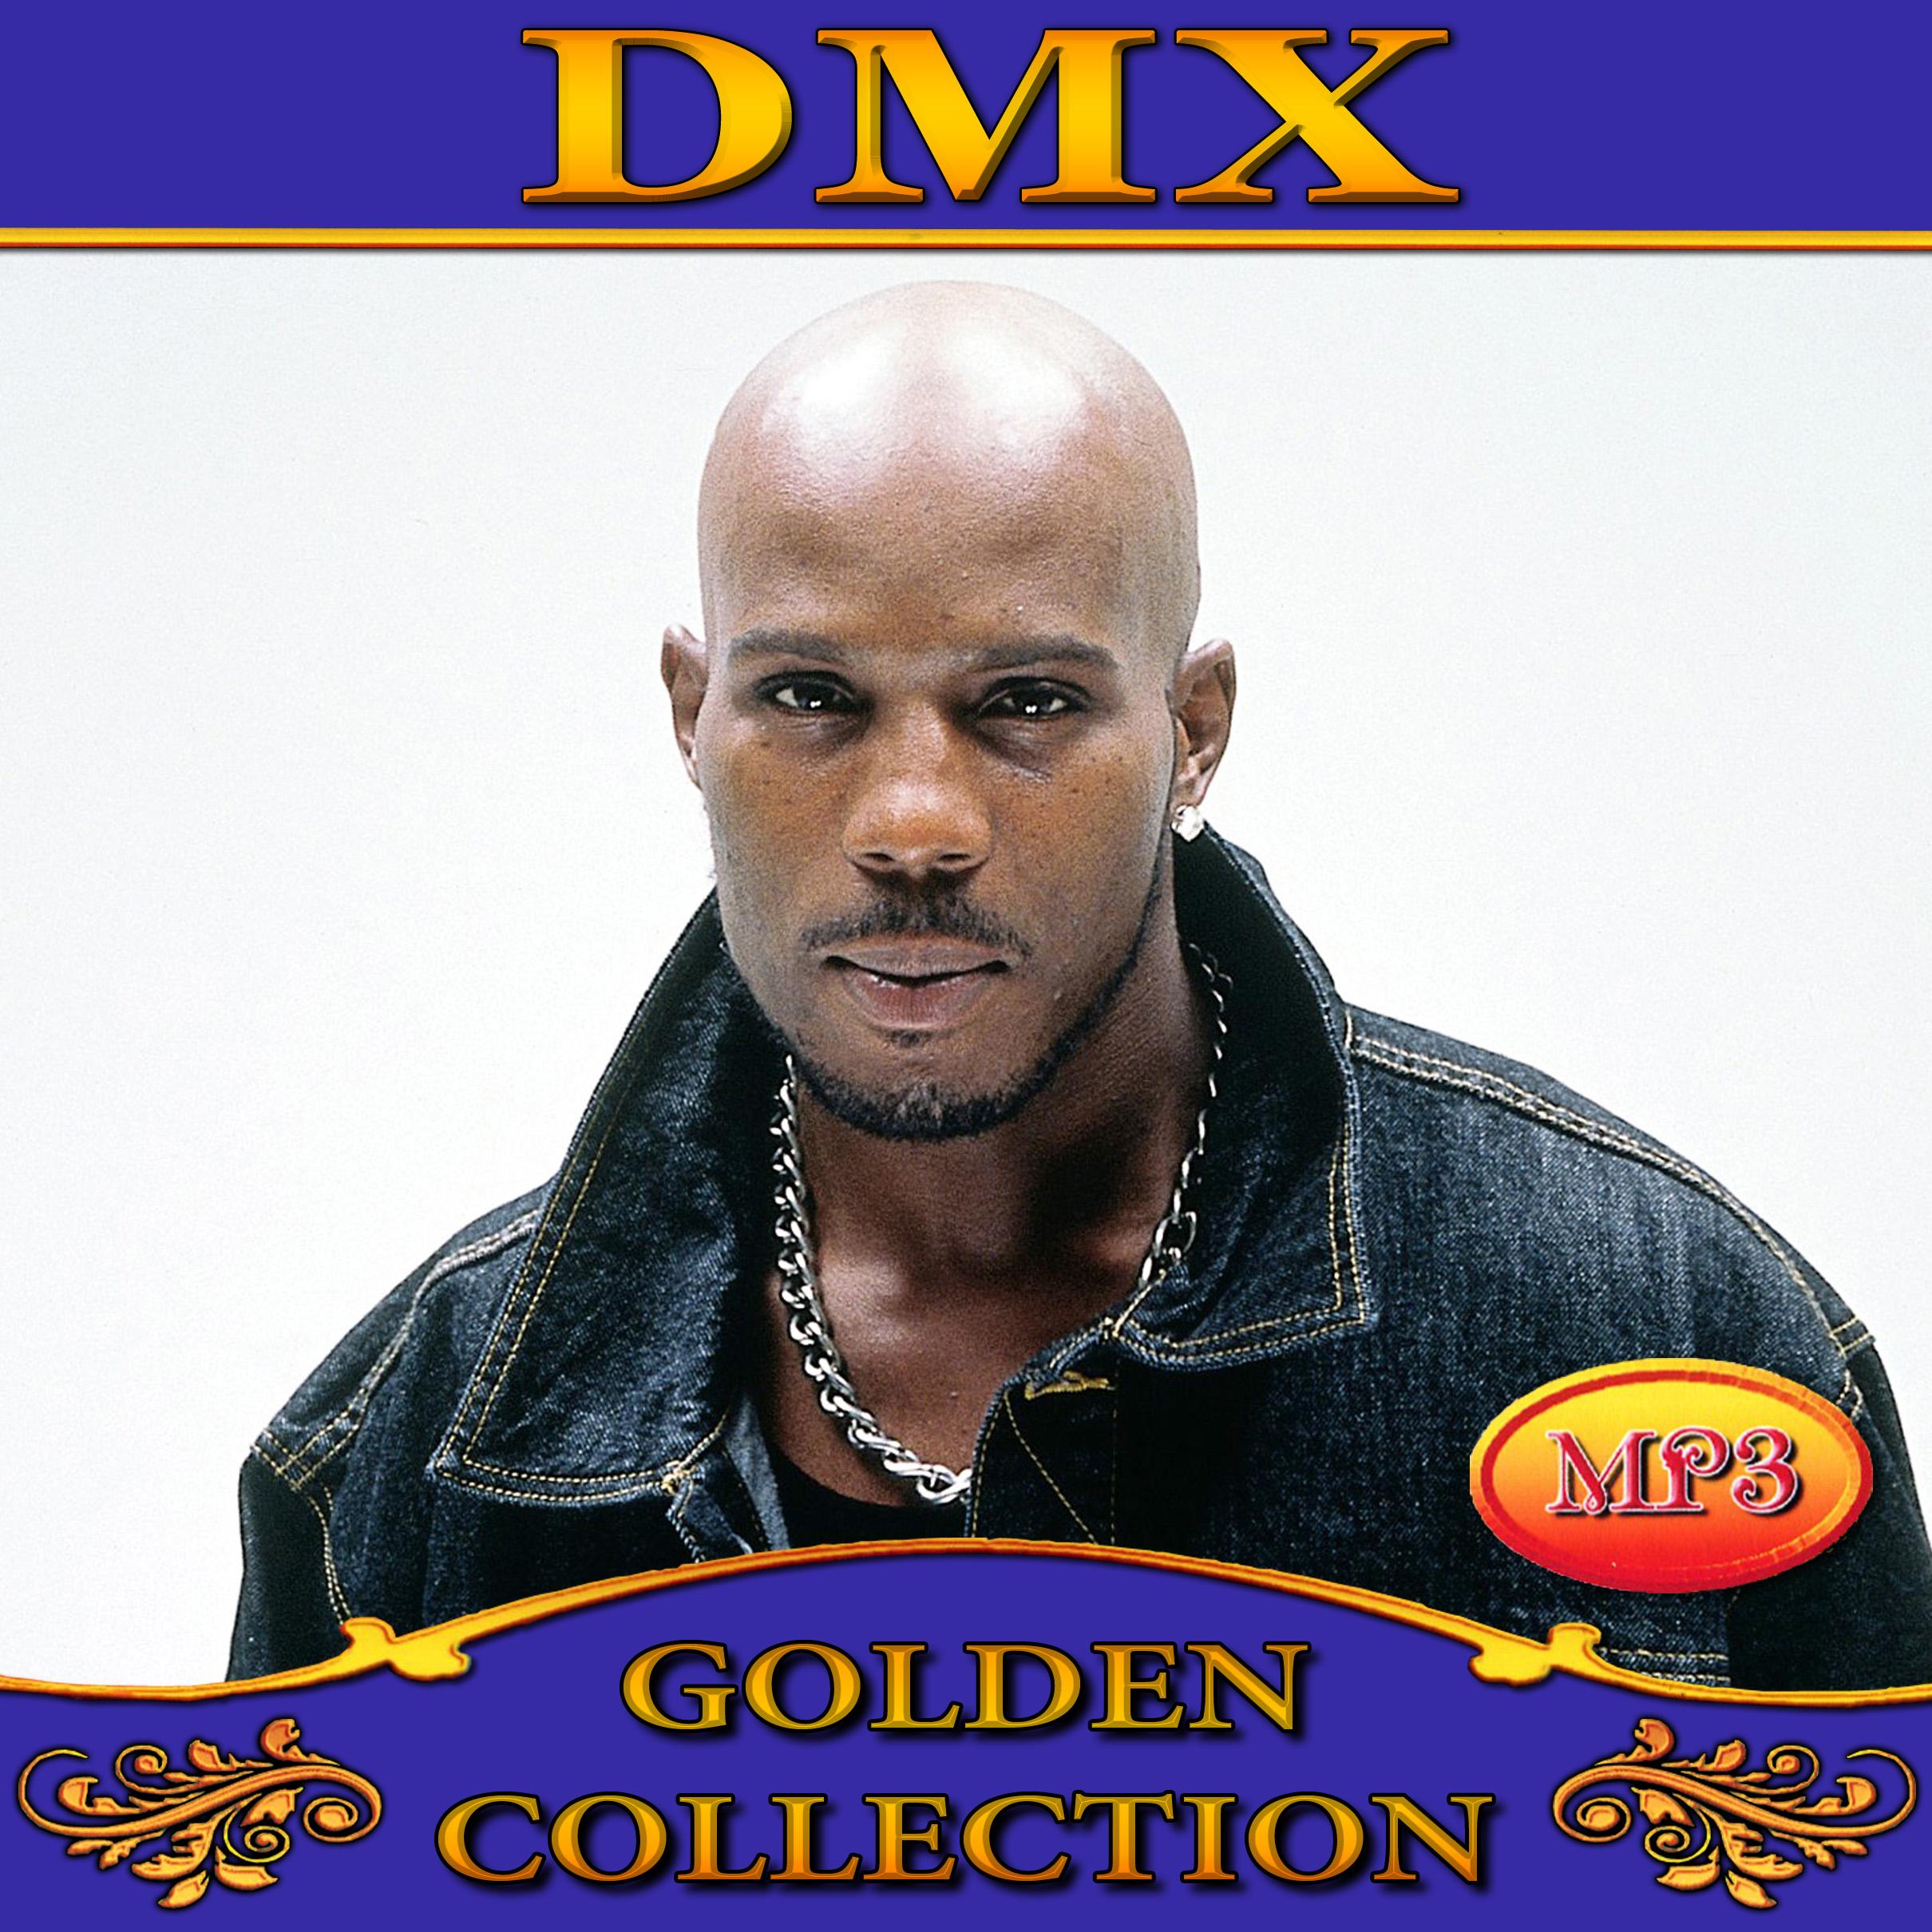 DMX [mp3]